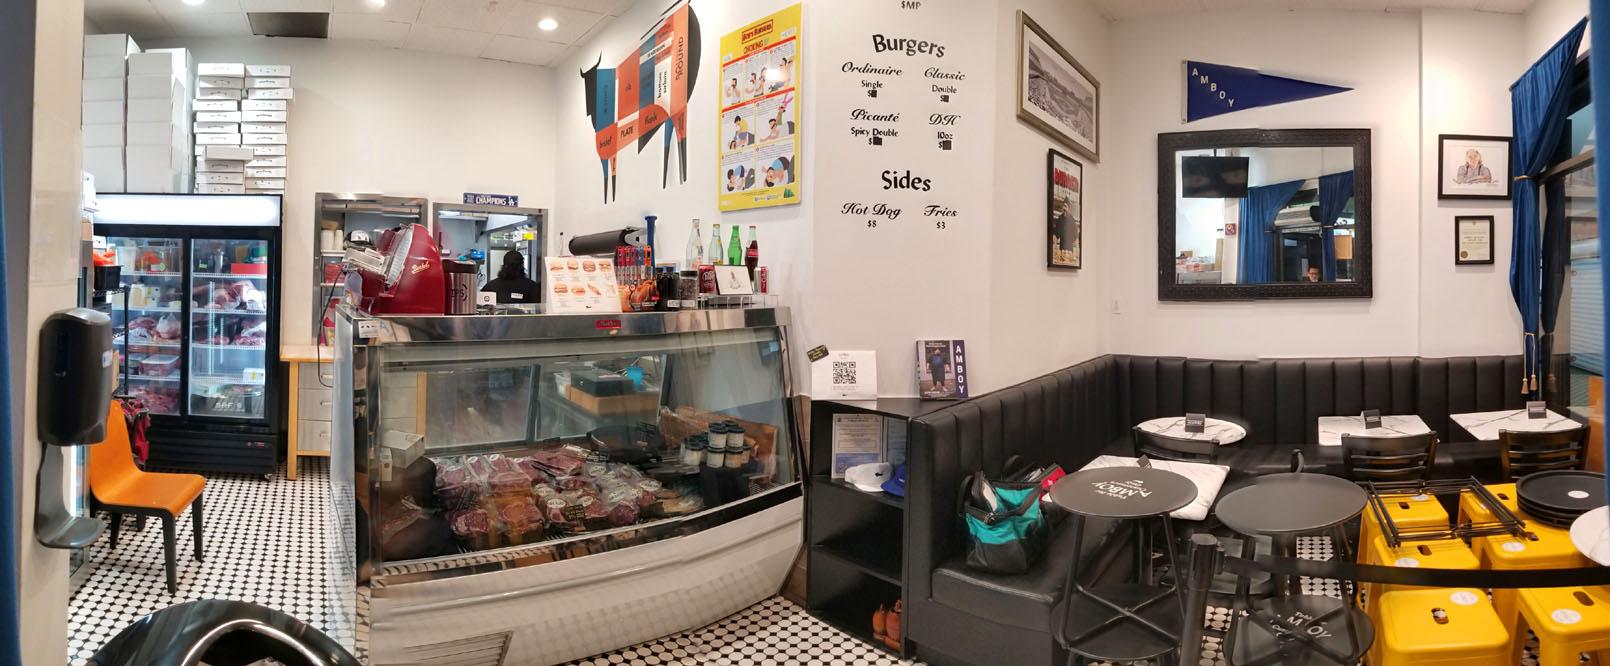 Amboy Quality Meats & Delicious Burgers Interior